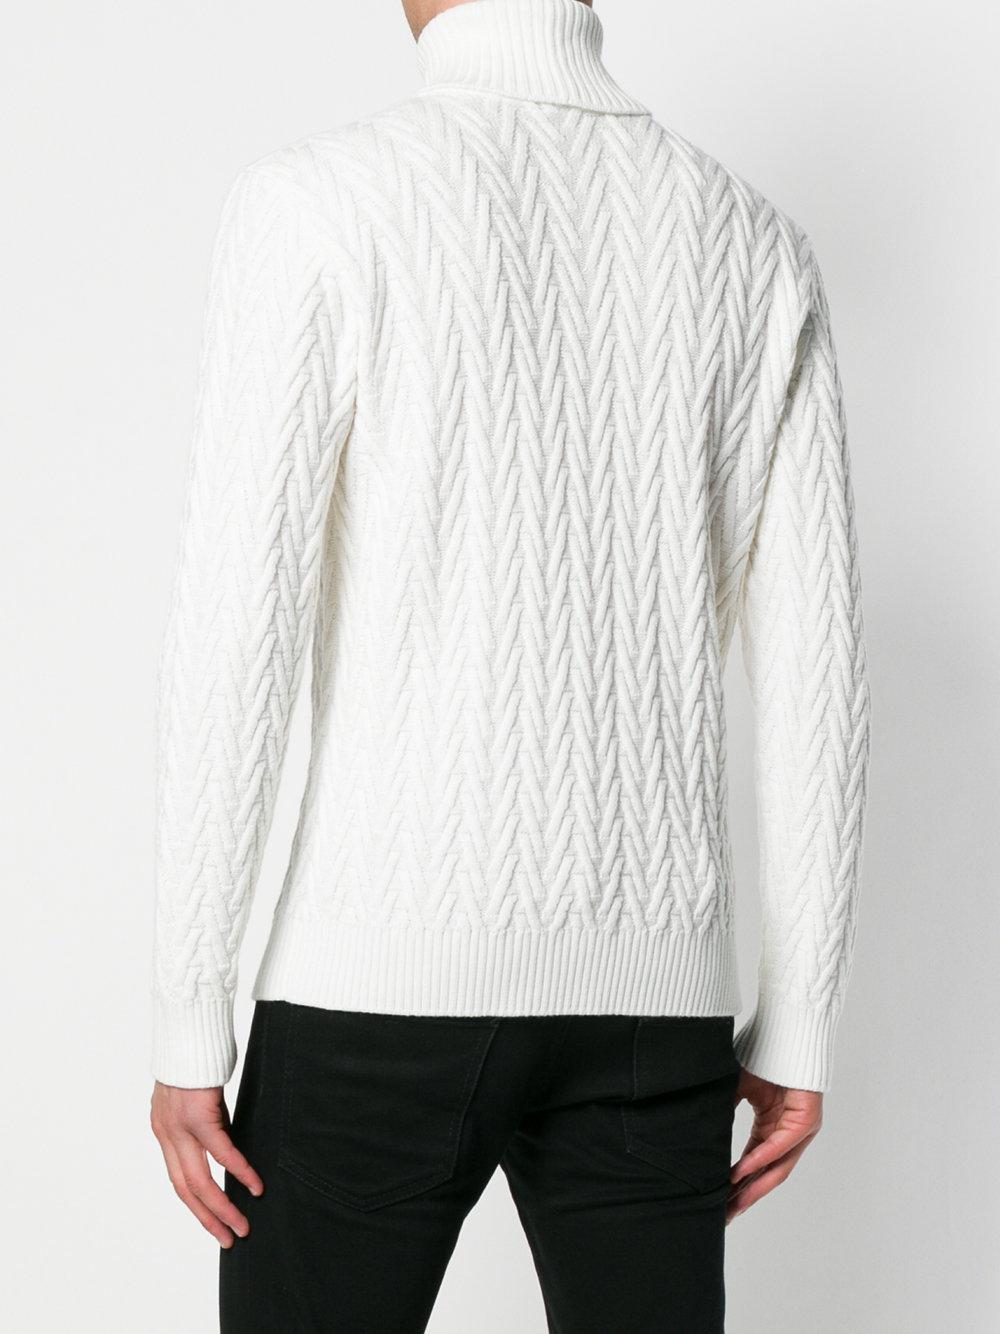 Eleventy Wool Chevron Knit Jumper in White for Men